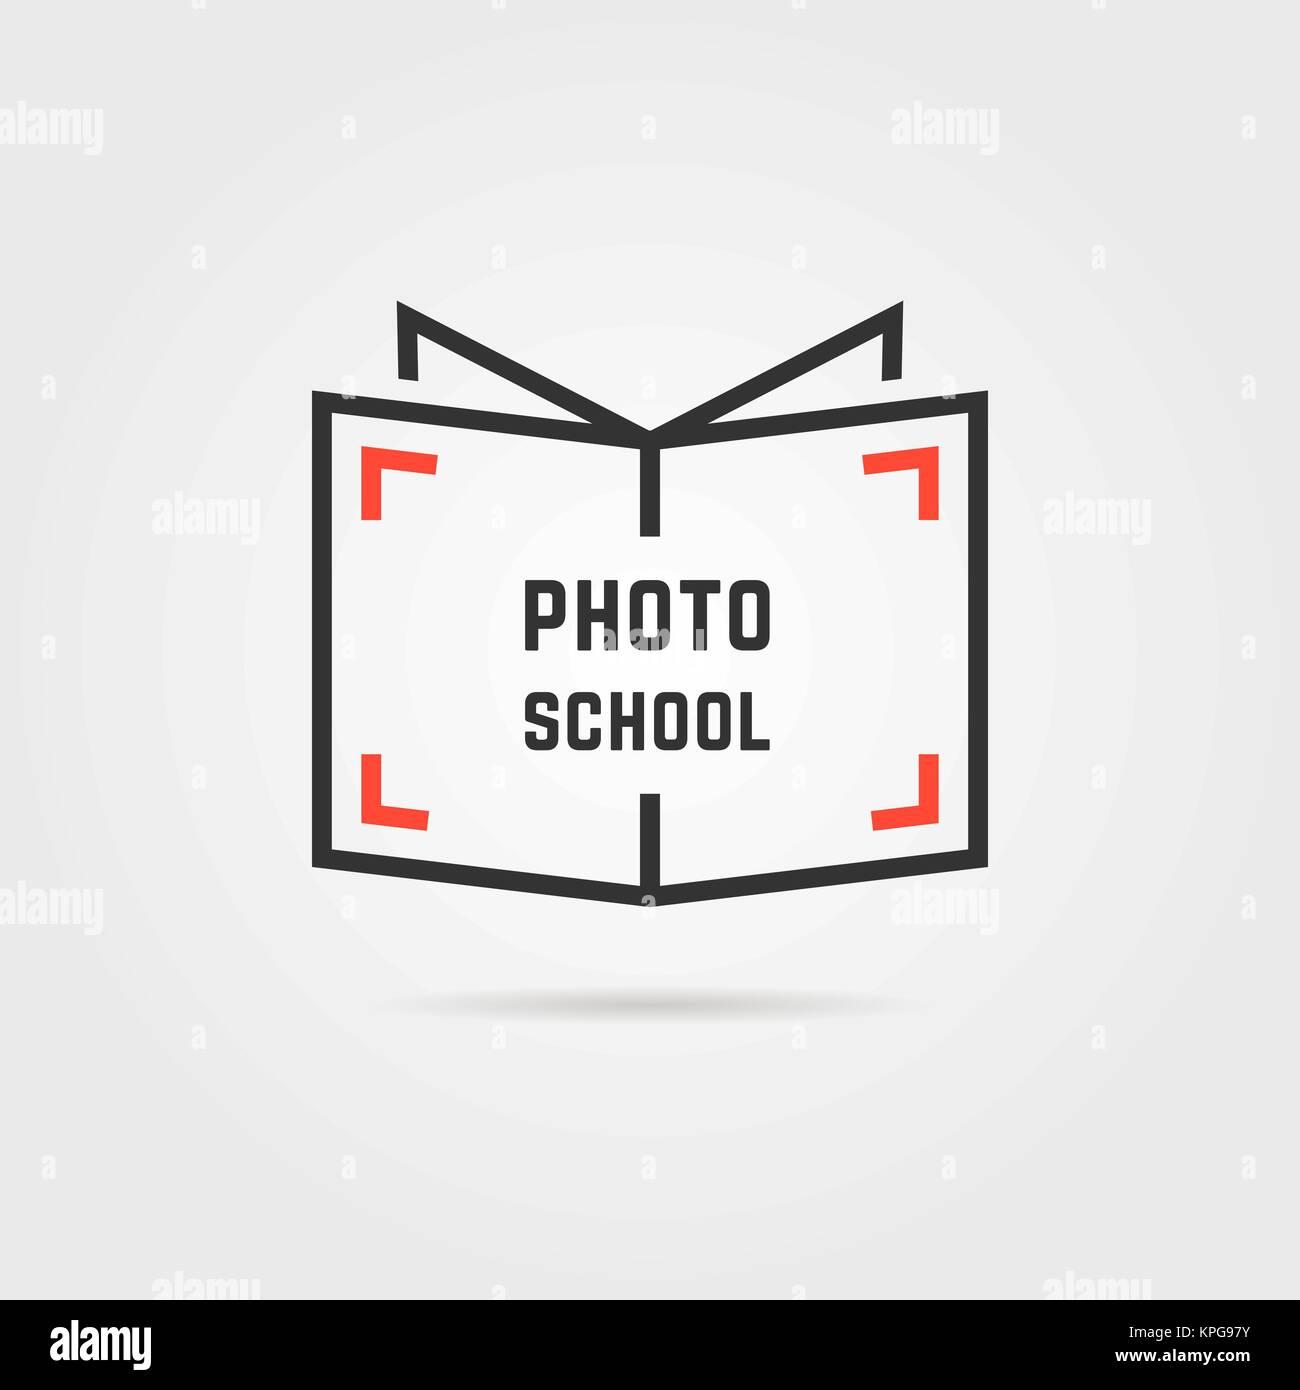 photo school logo with shadow - Stock Image